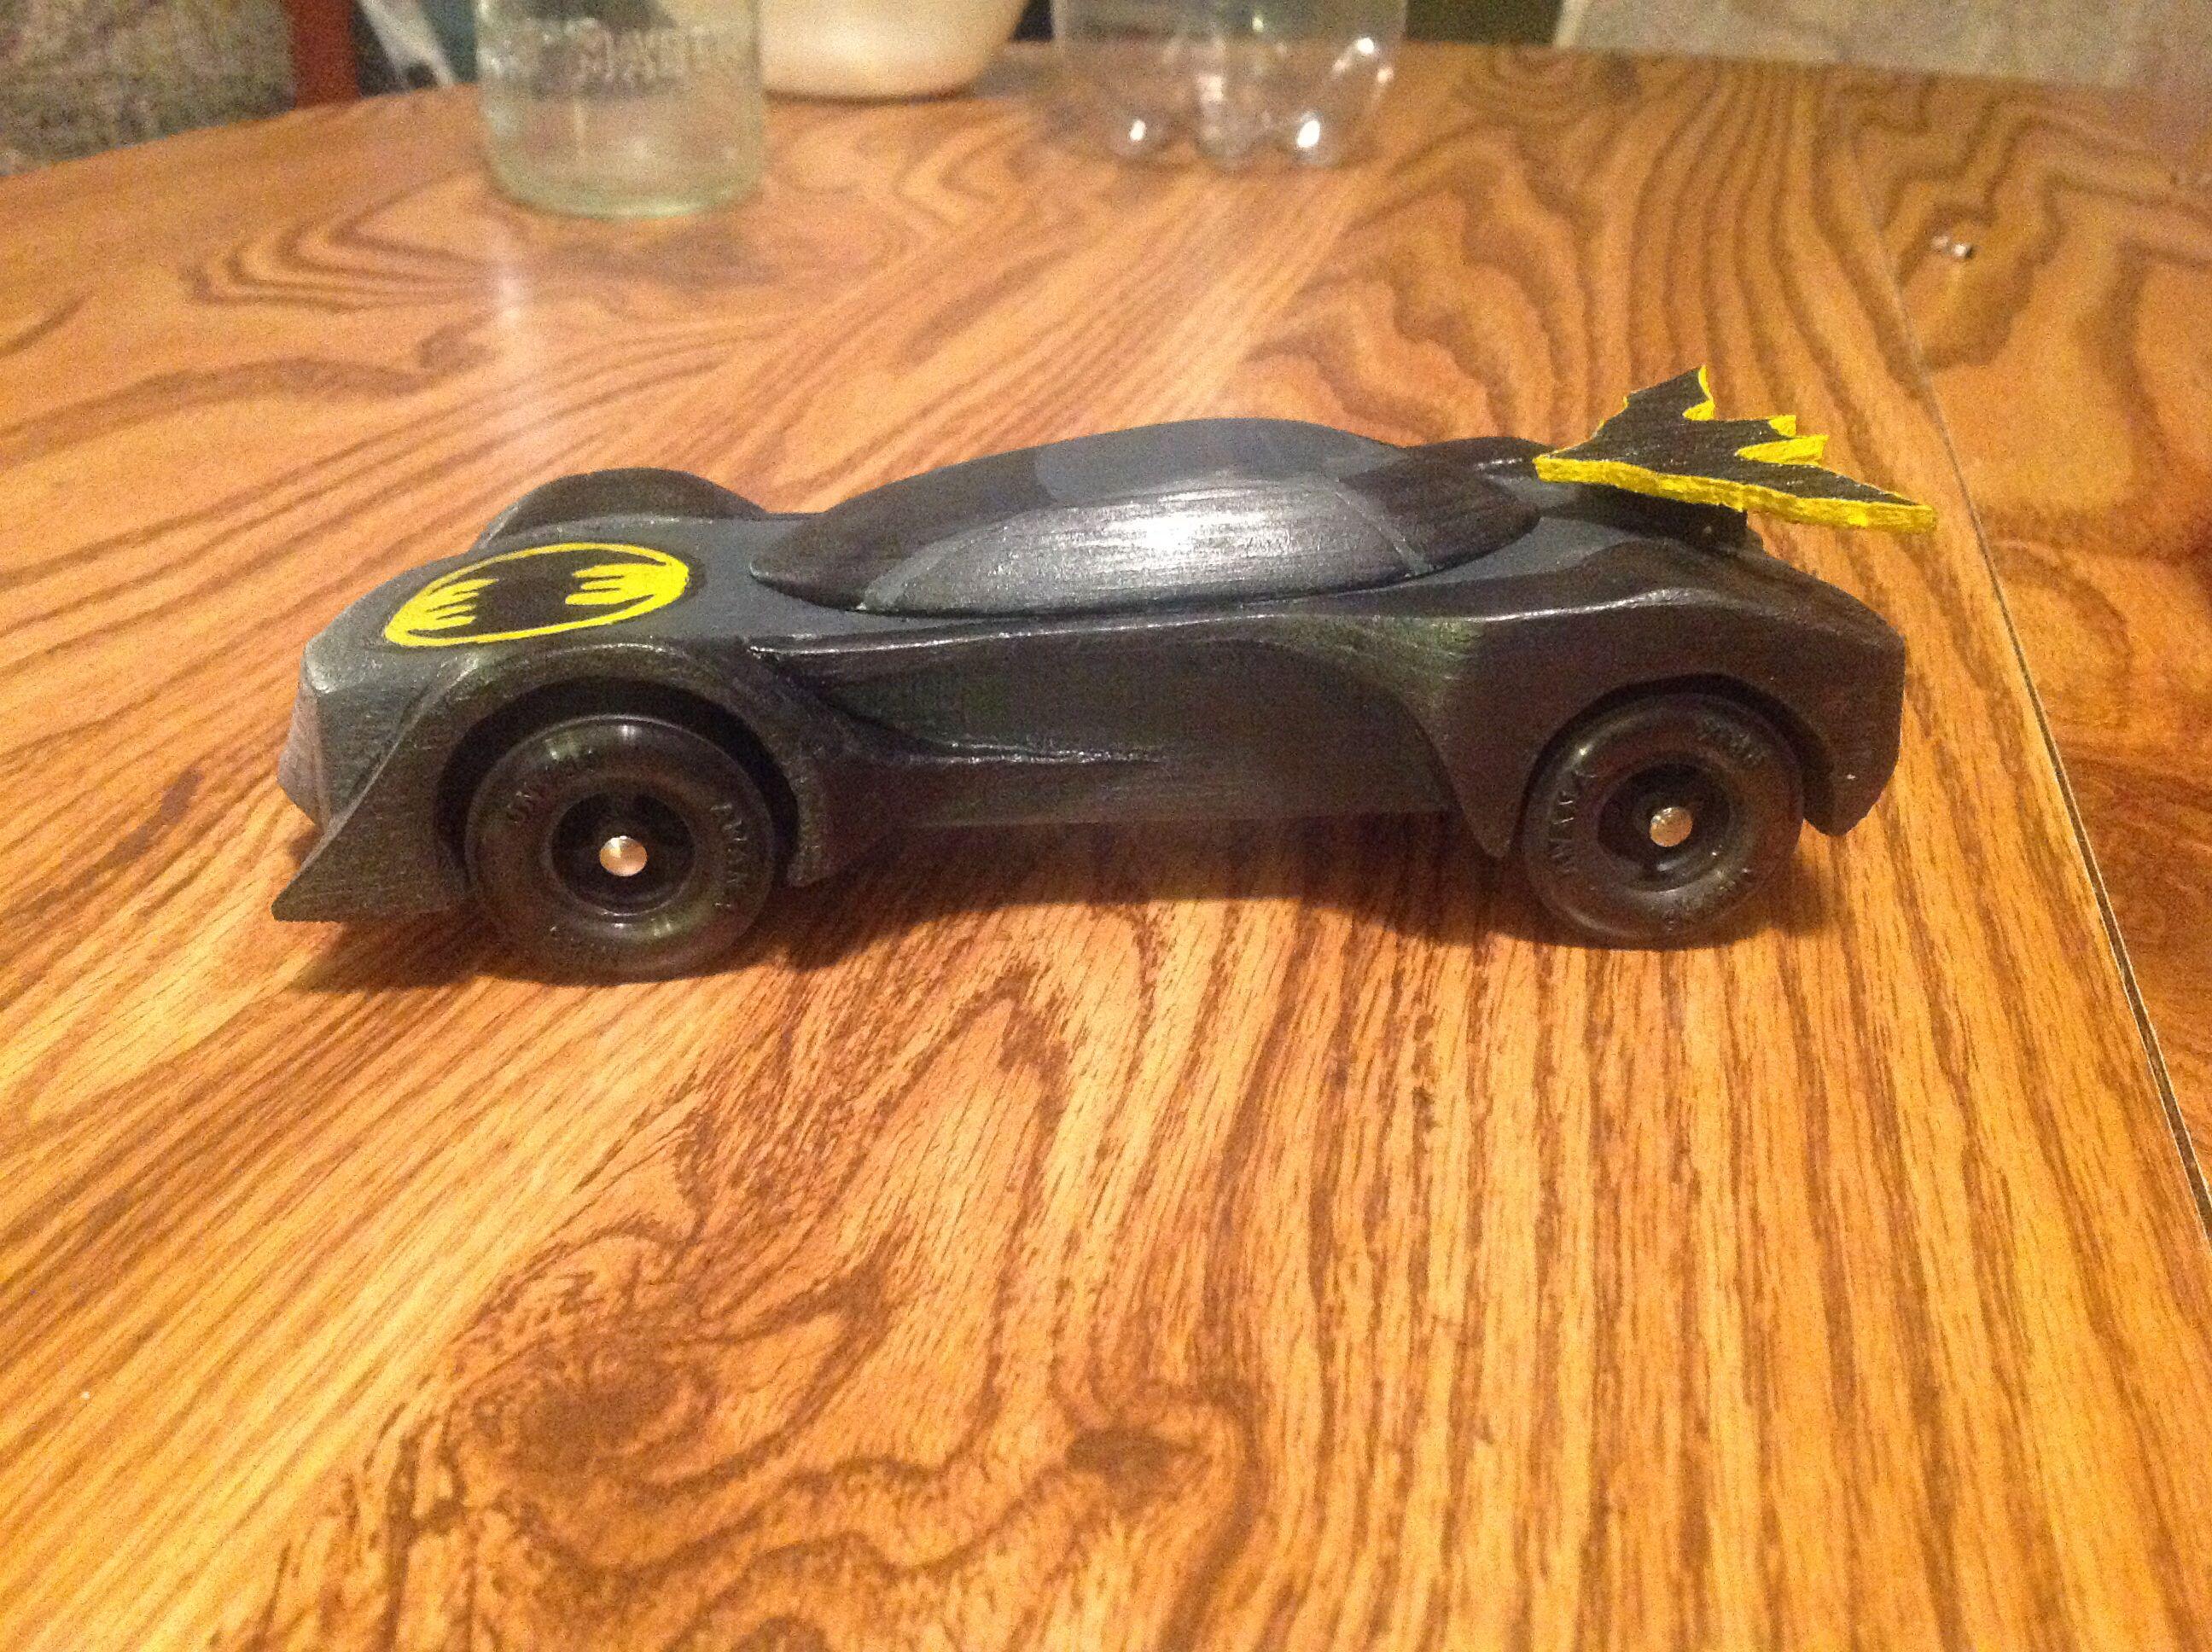 Batman pinewood derby car | Pinewood derby car | Pinterest